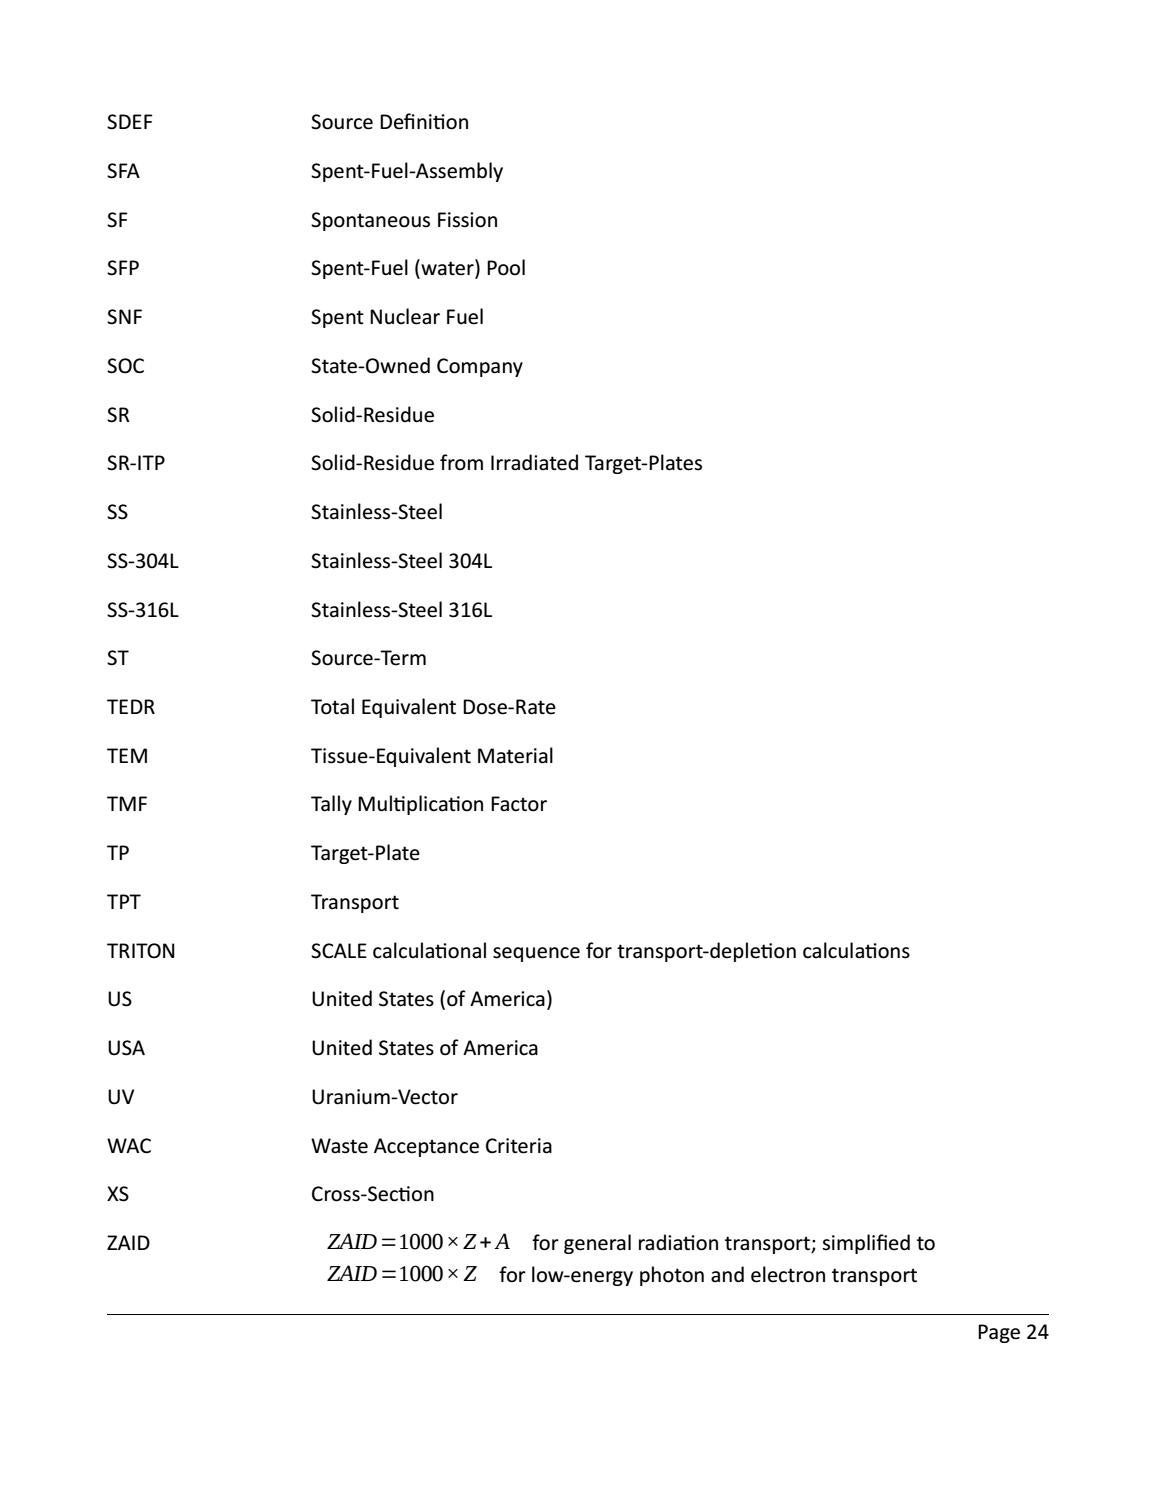 RADIOACTIVE WASTE: COMPUTATIONAL CHARACTERISATION and SHIELDING page 24